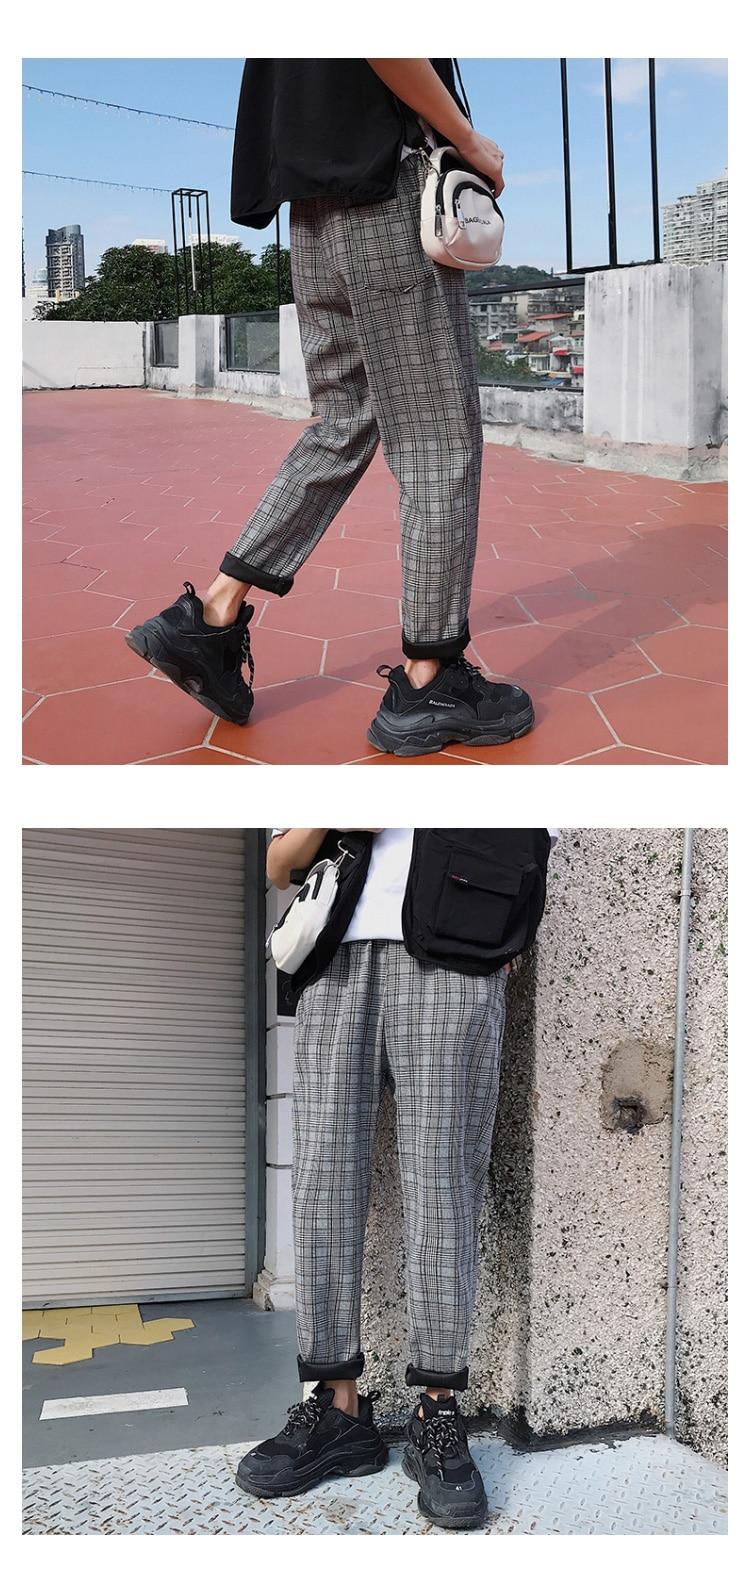 LAPPSTER Streetwear Yellow Plaid Pants Men Joggers 19 Man Casual Straight Harem Pants Men Korean Hip Hop Track Pants Plus Size 24